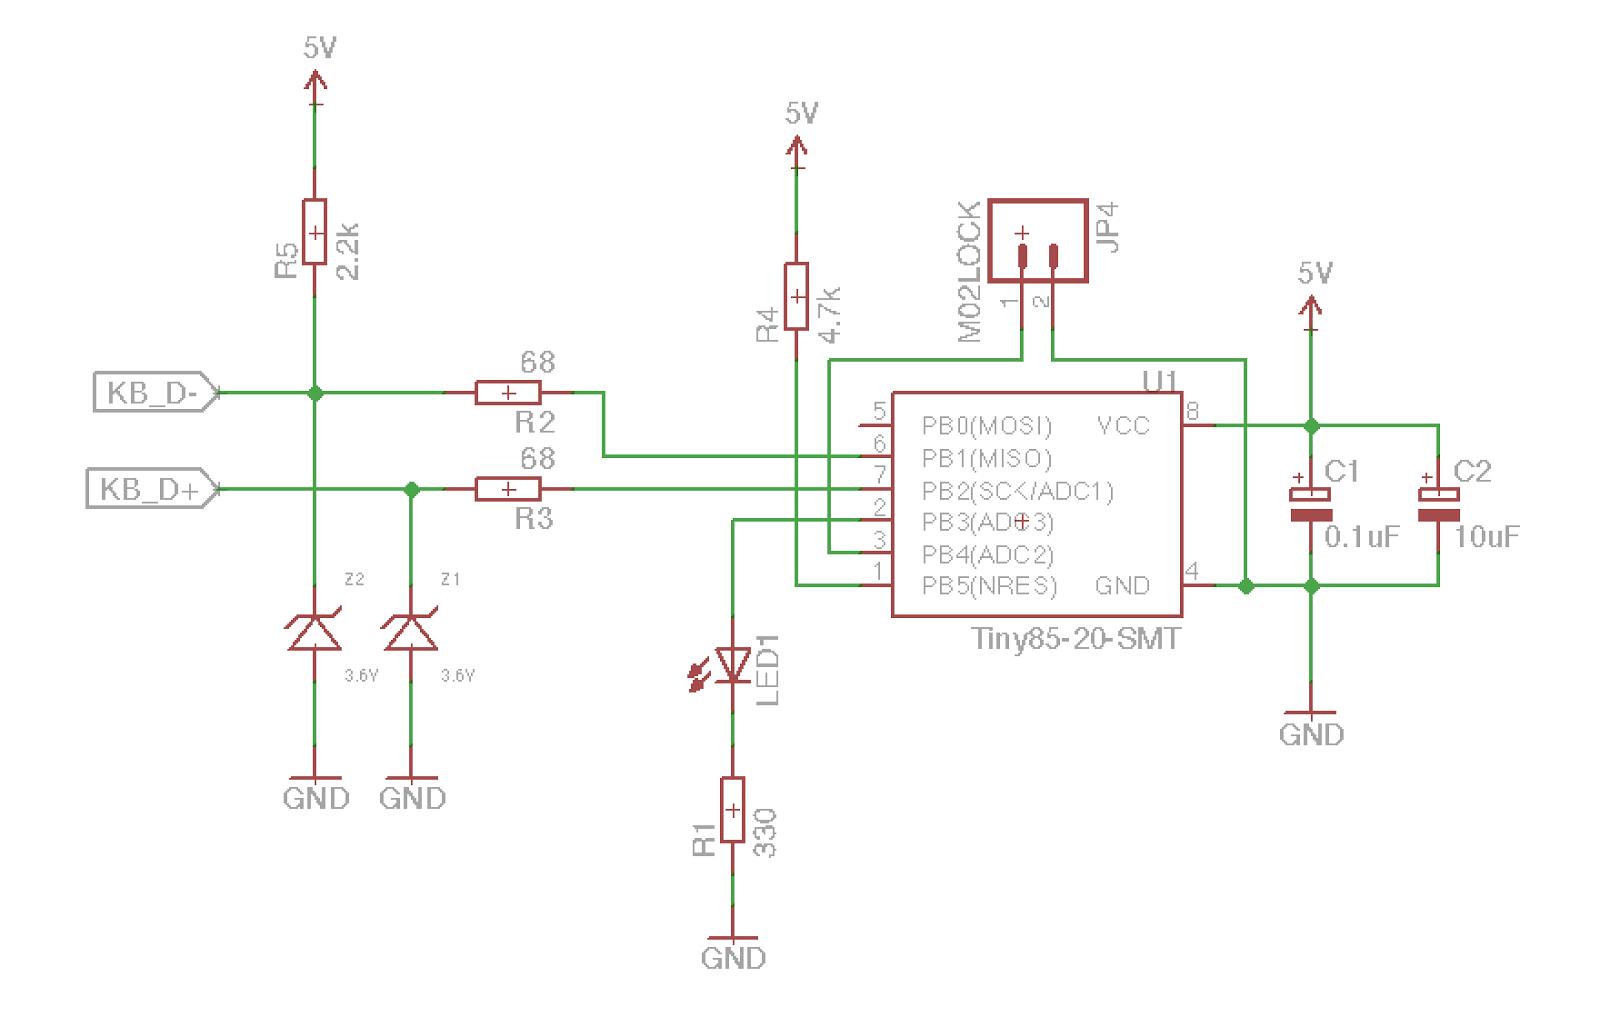 usb keyboard circuit diagram usb image wiring diagram building a usb kvm using attiny85 and fsusb30 part 1 erikandre org on usb keyboard circuit